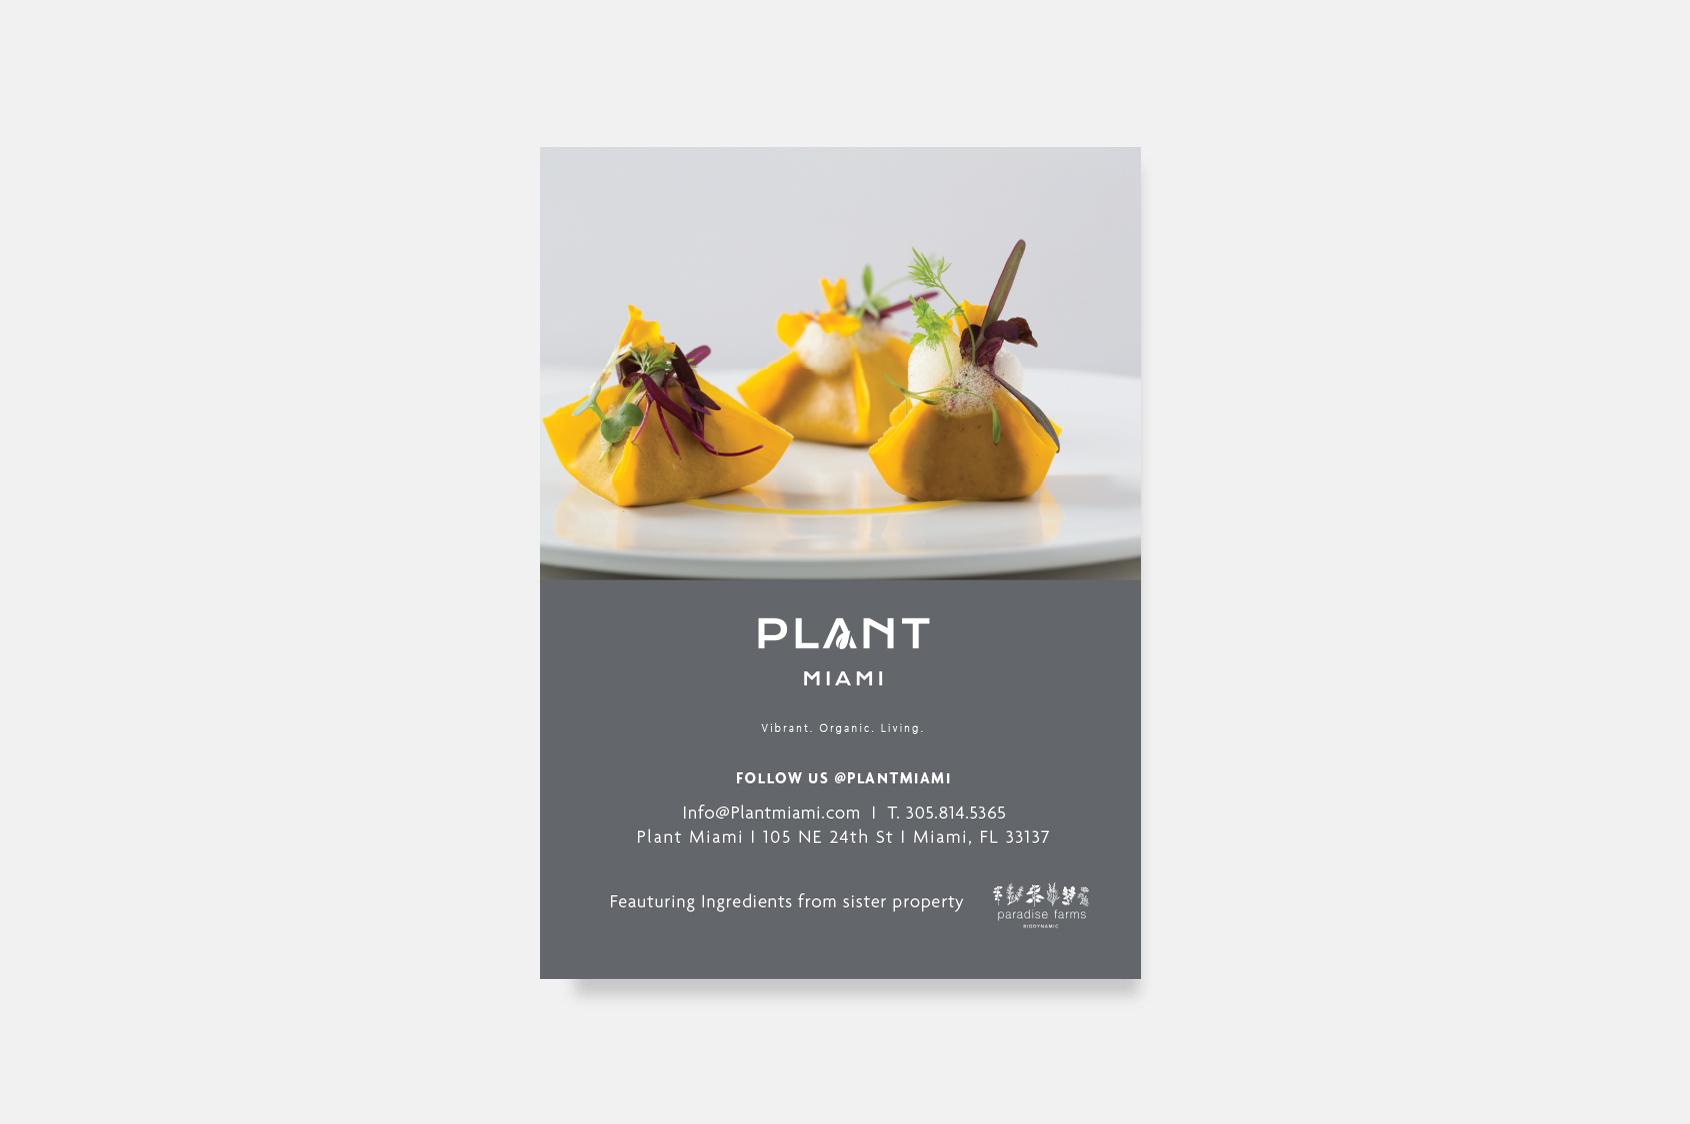 Plant_sign.jpg